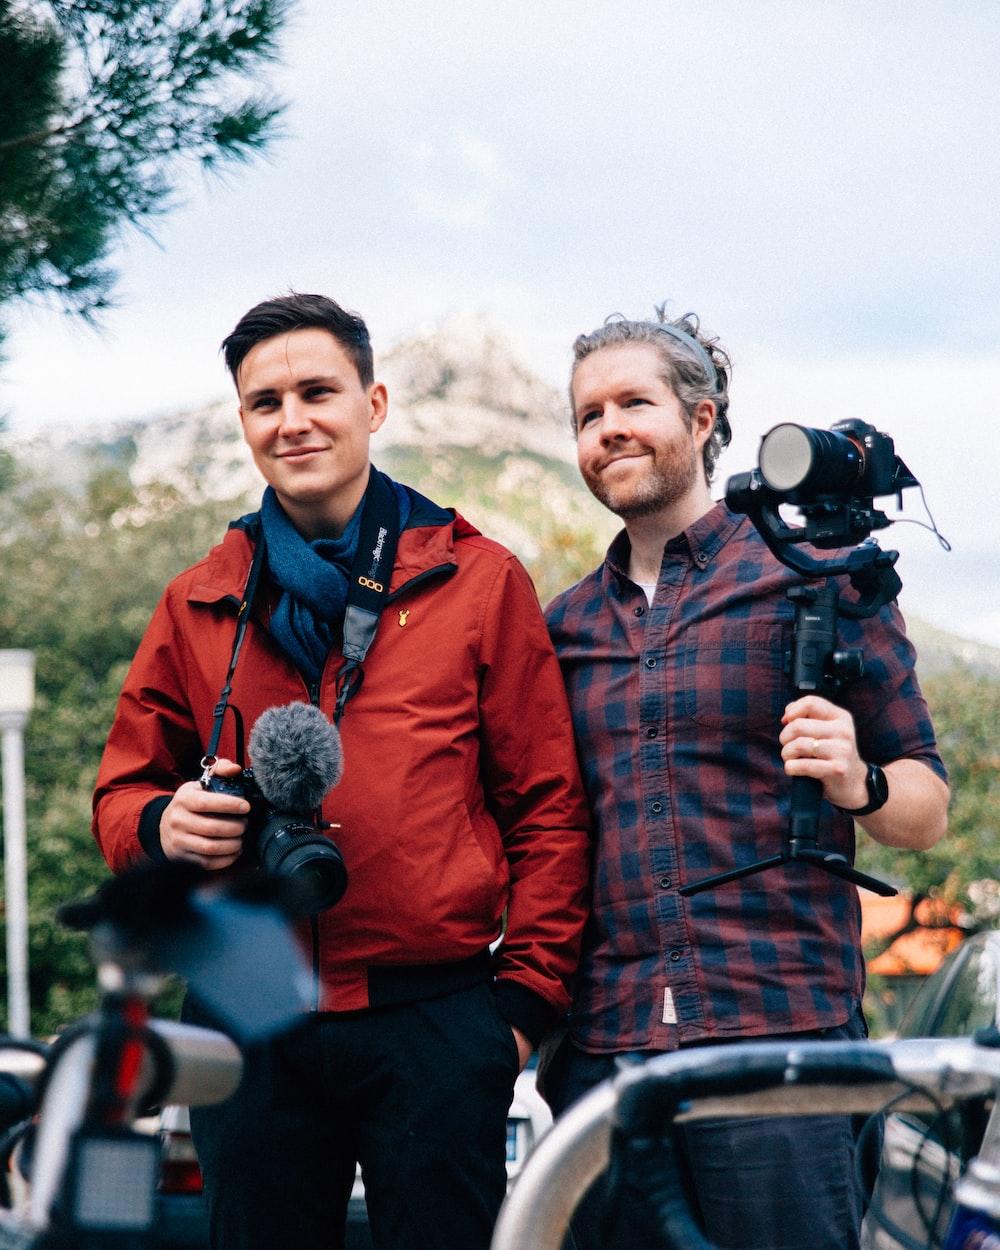 tow men holding cameras during daytime